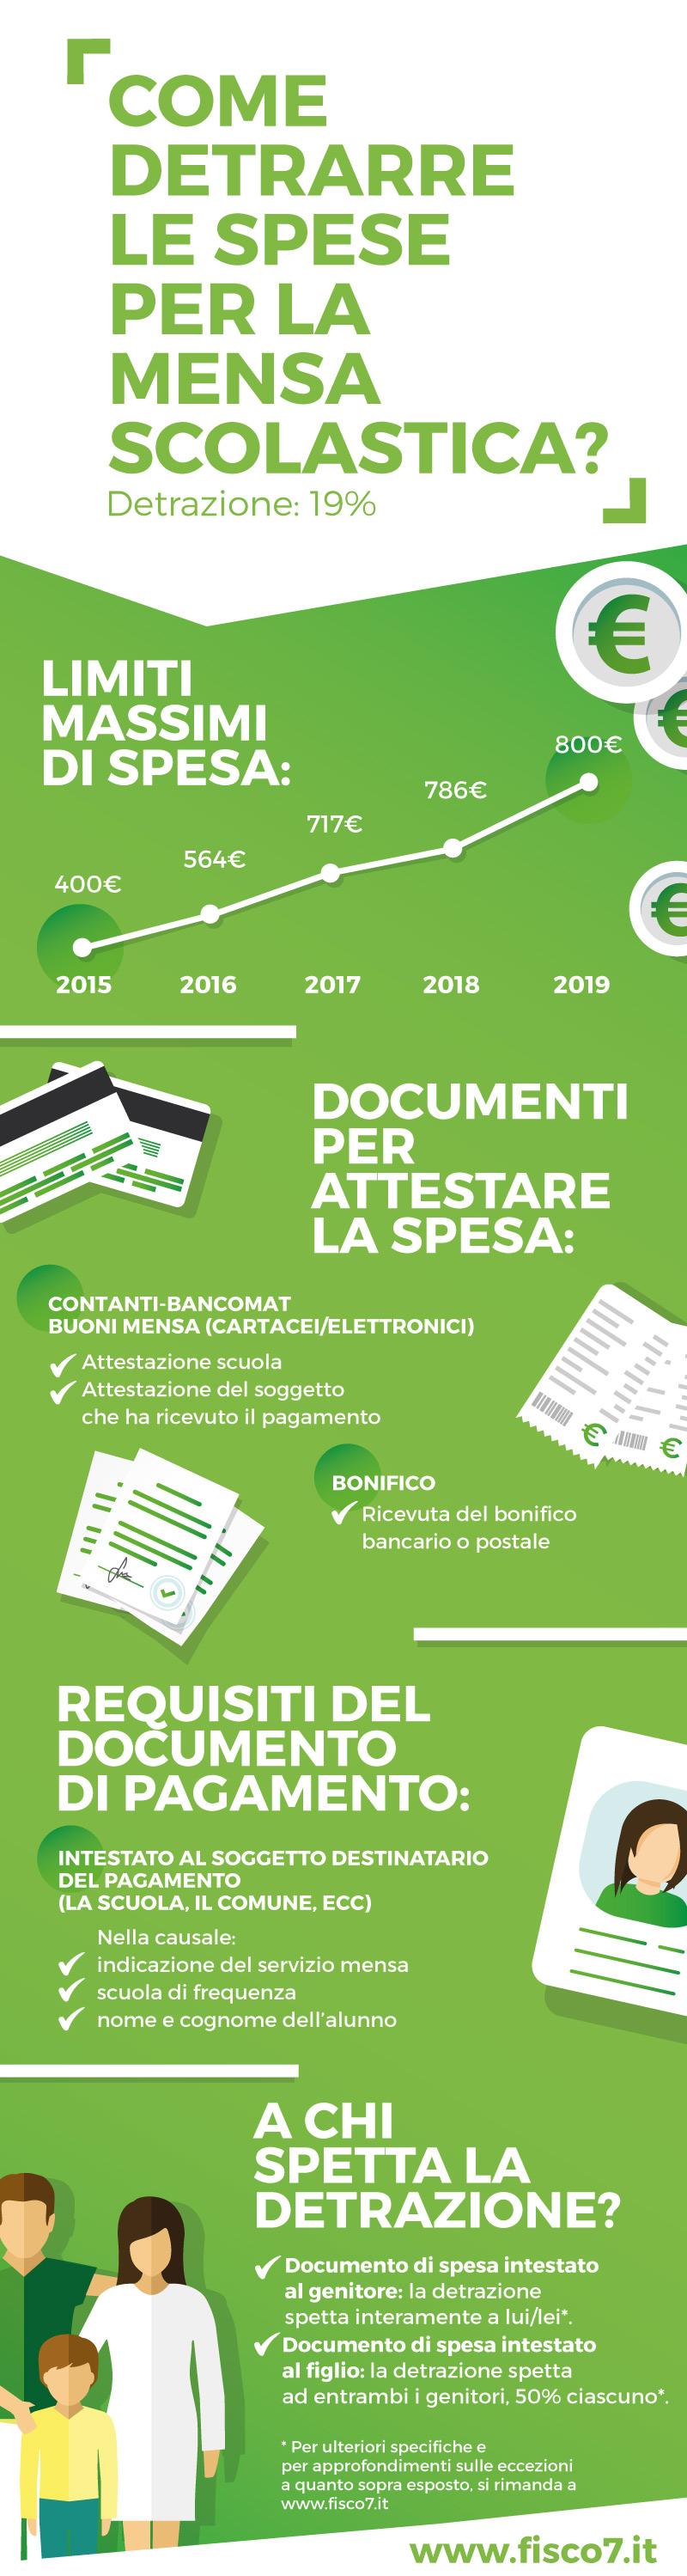 infografica_Fisco7_mensa